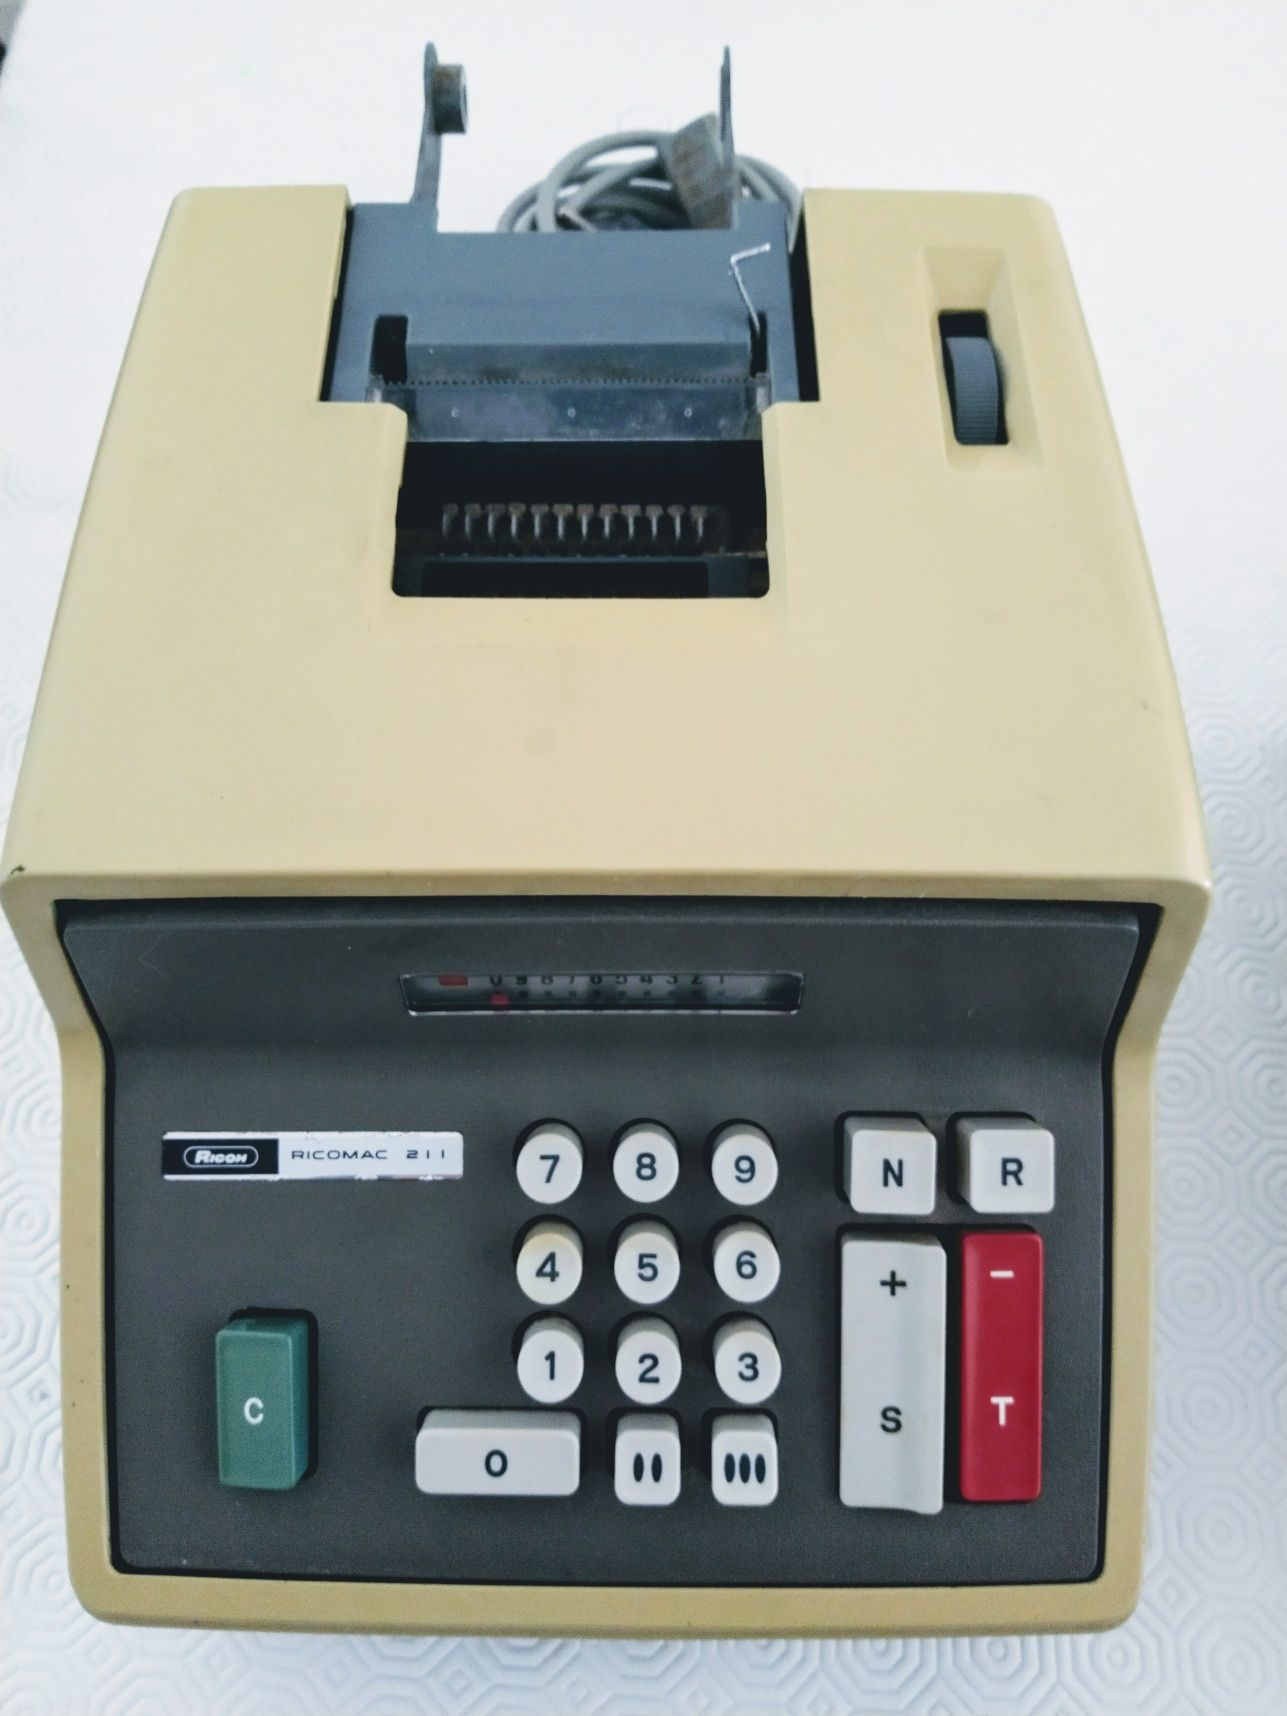 Máquina calculadora antiga avariada